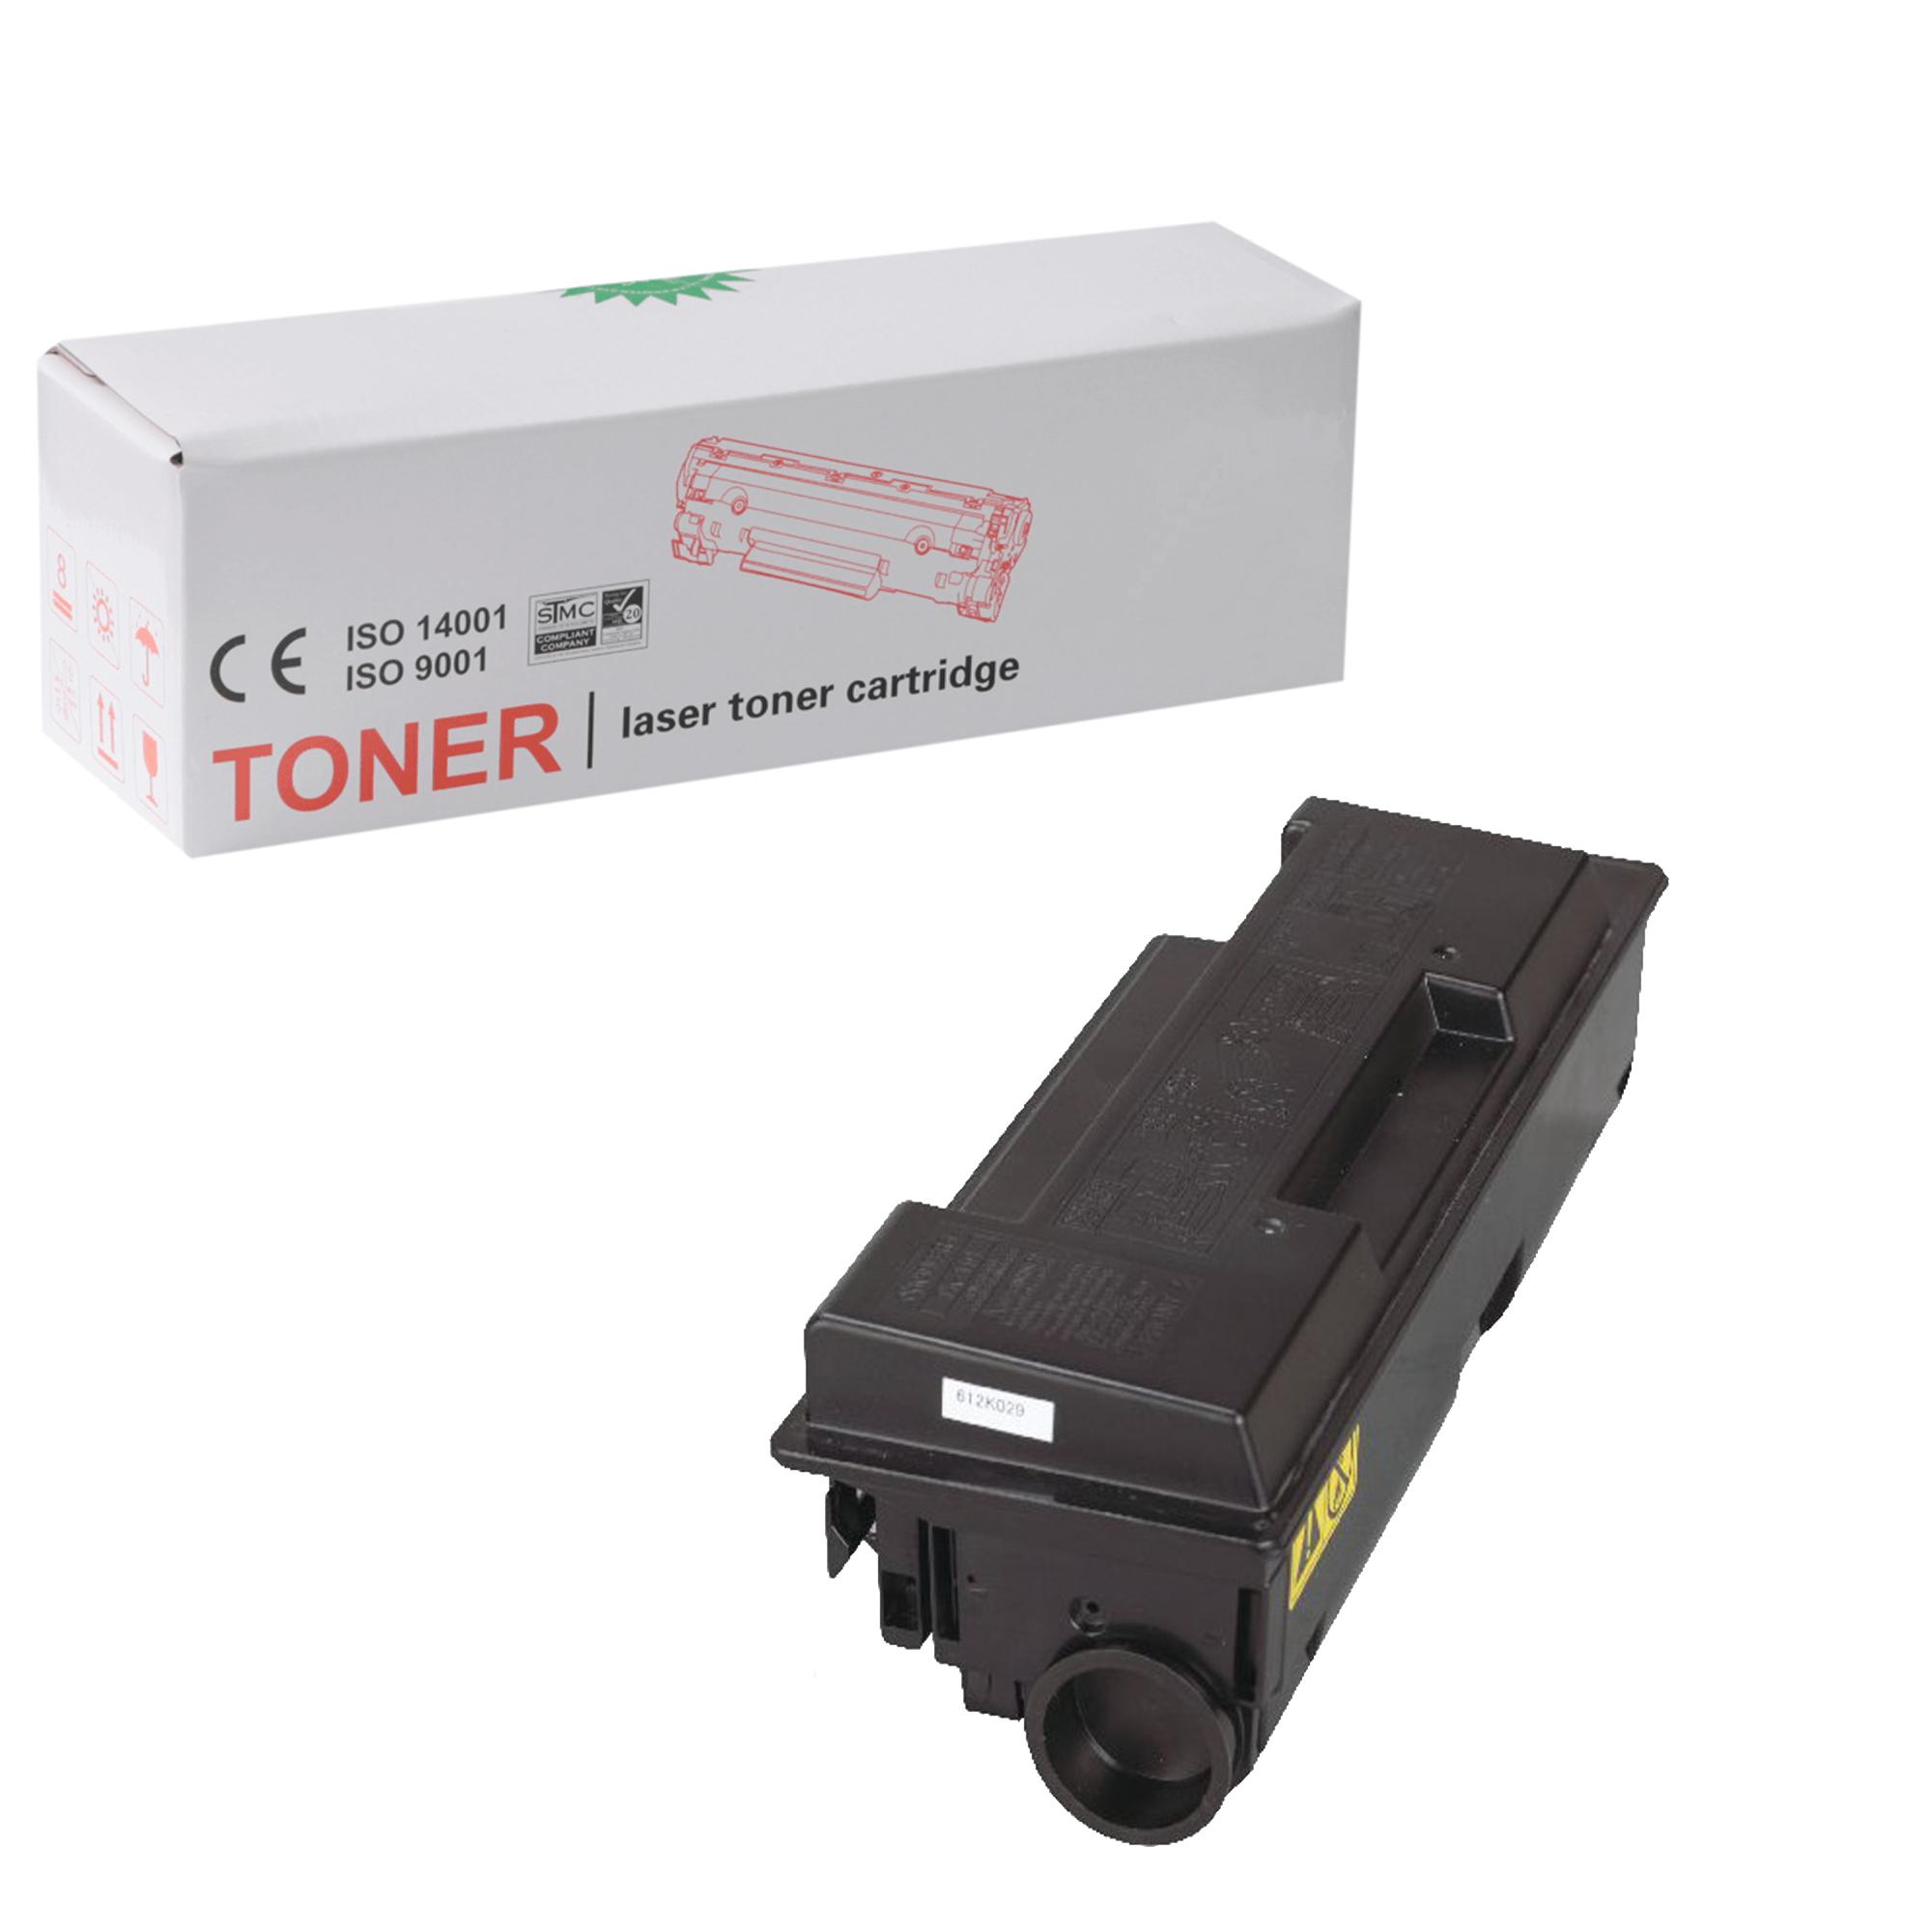 Kyocera - KYOCERA TK-3060 Siyah Muadil Toner